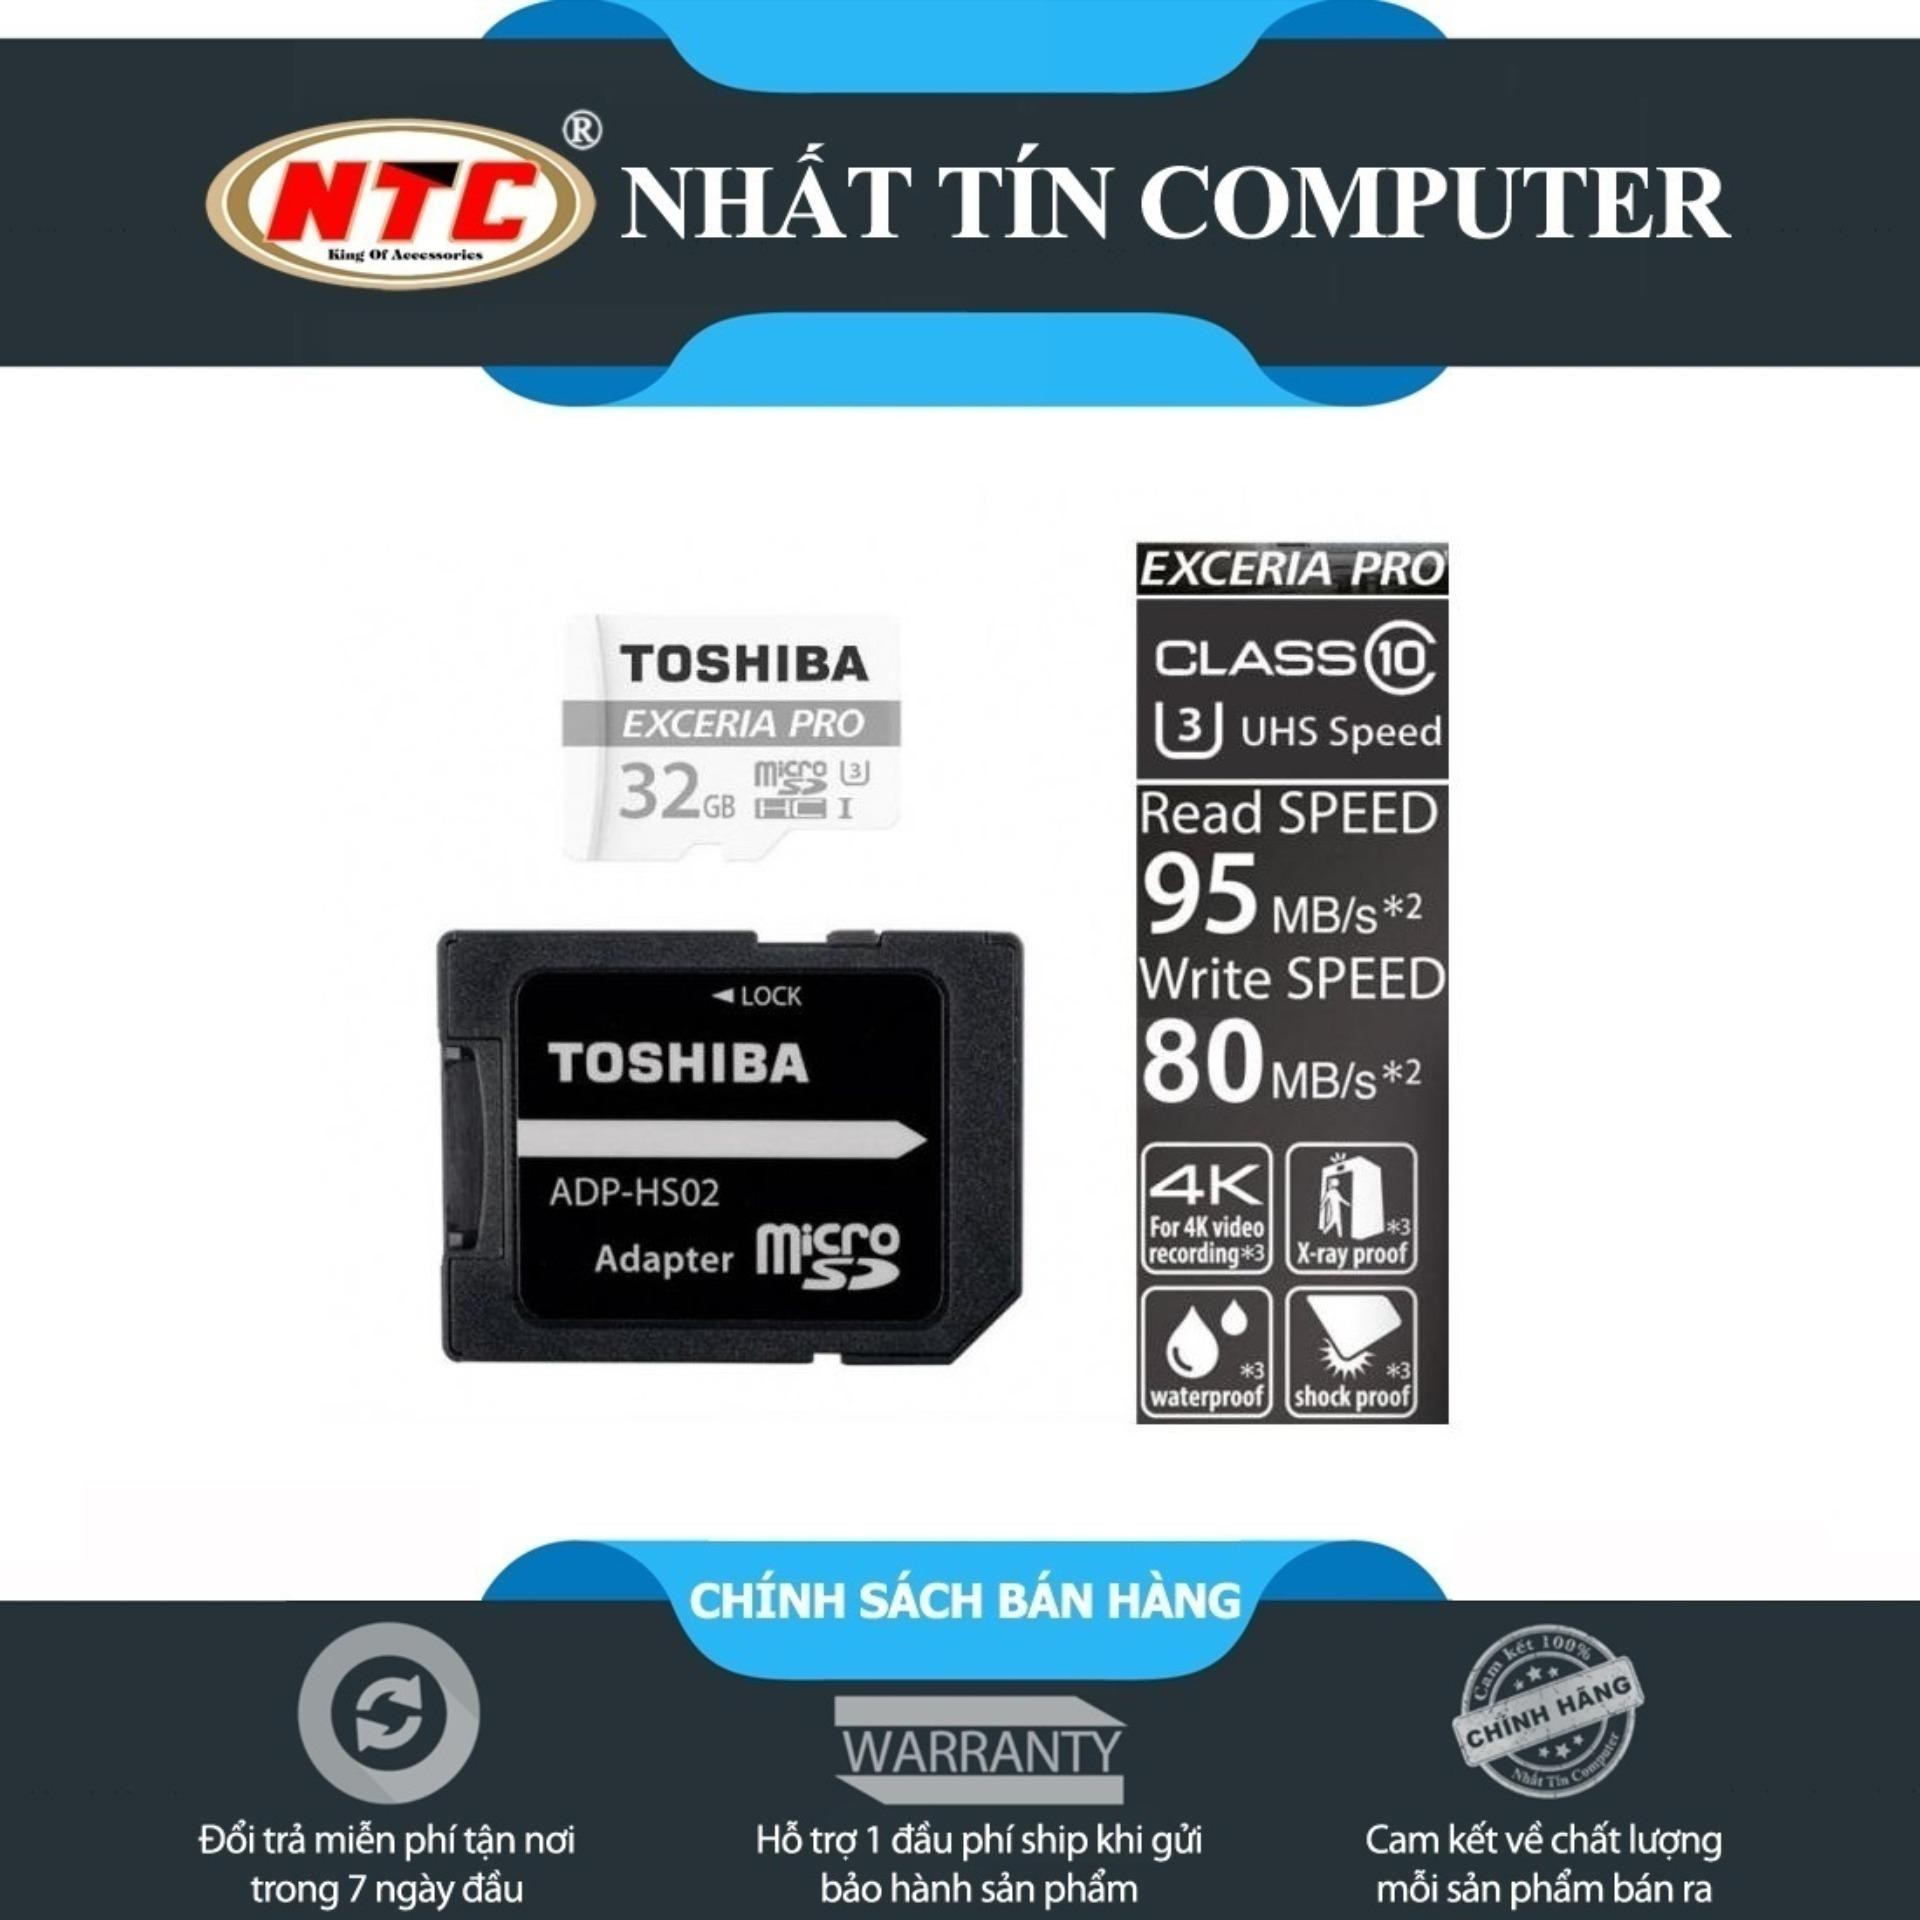 Thẻ nhớ MicroSDXC Toshiba Exceria Pro M401 64GB UHS-I U3 4K 95MB.s [Trắng] - Toshiba Exxceria 5